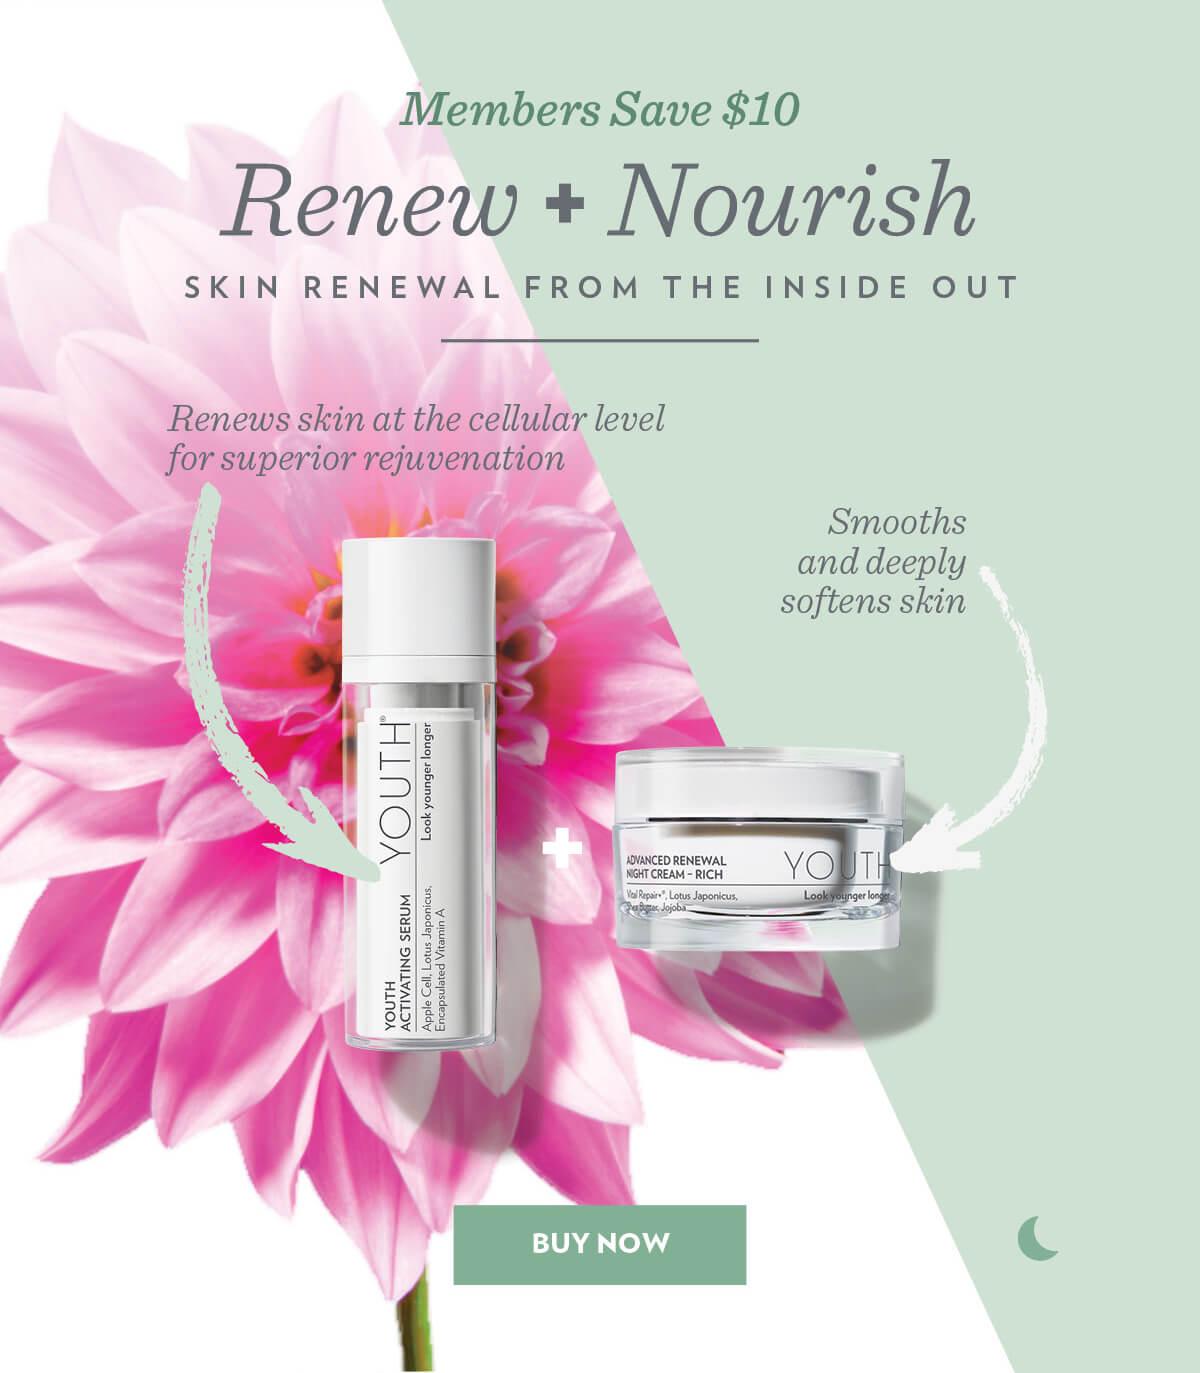 Members Save $10. Renew + Nourish